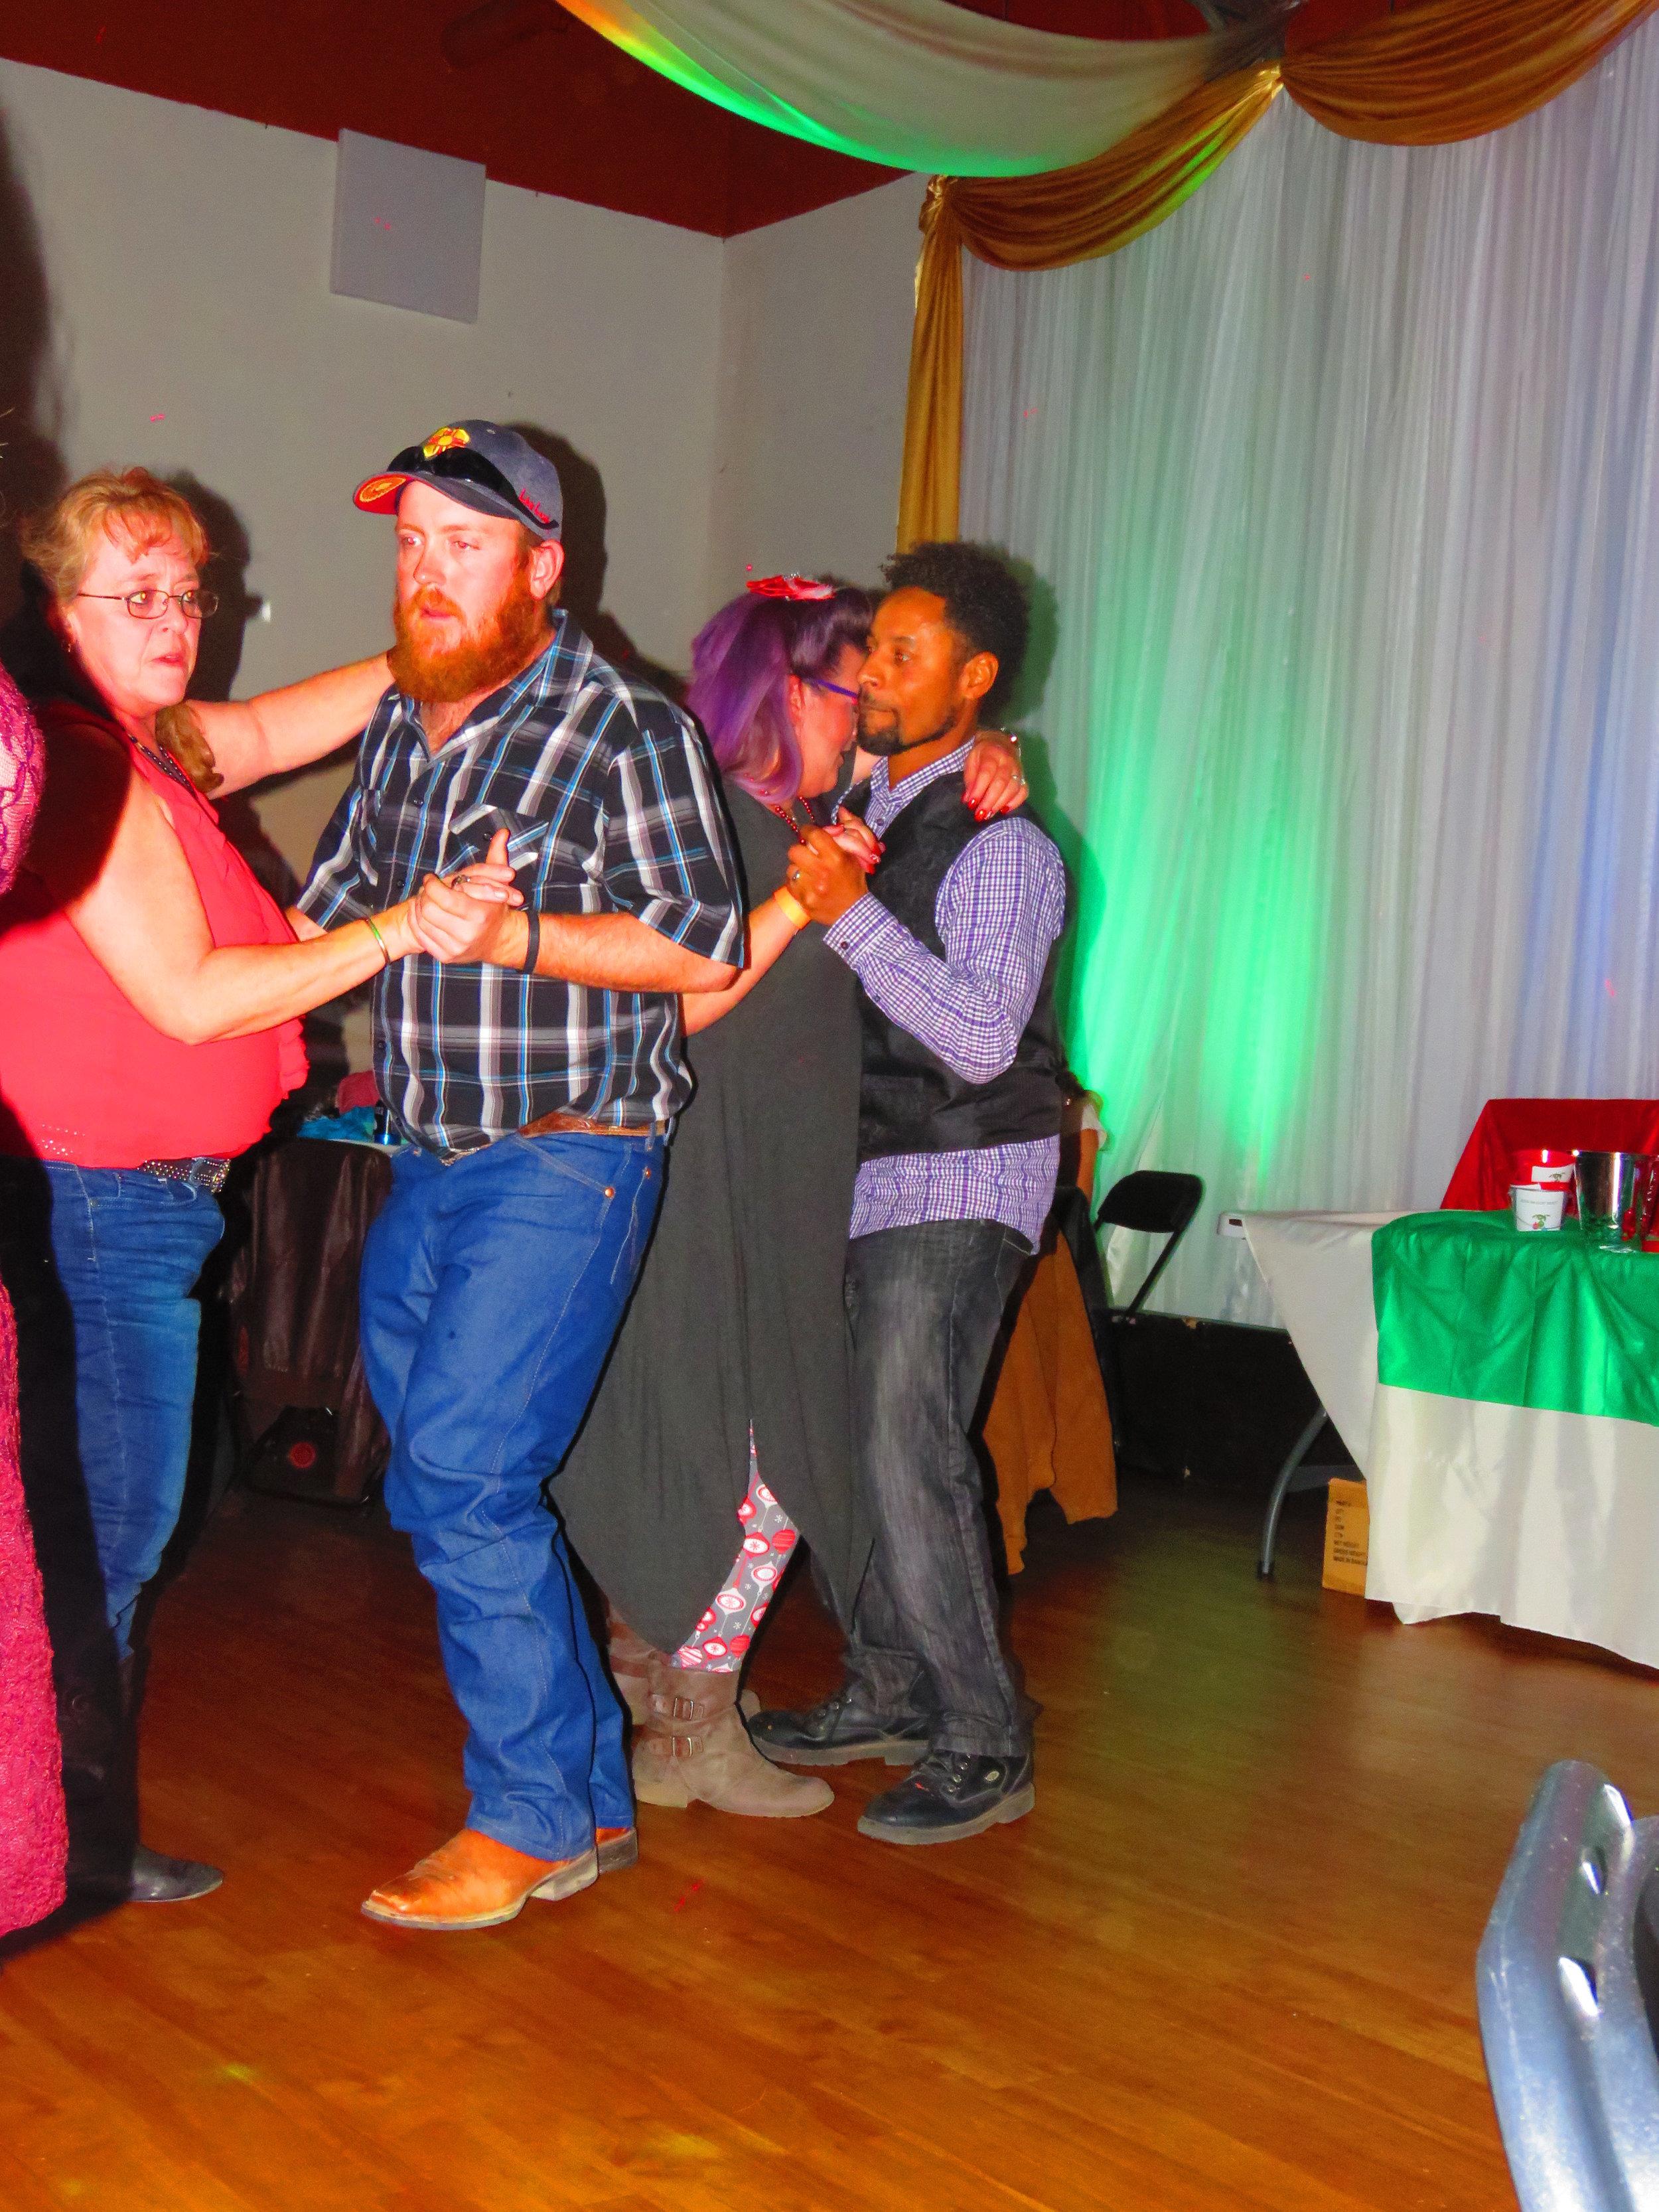 EZRA, MOM, STACEY & BRIAN DANCING.JPG